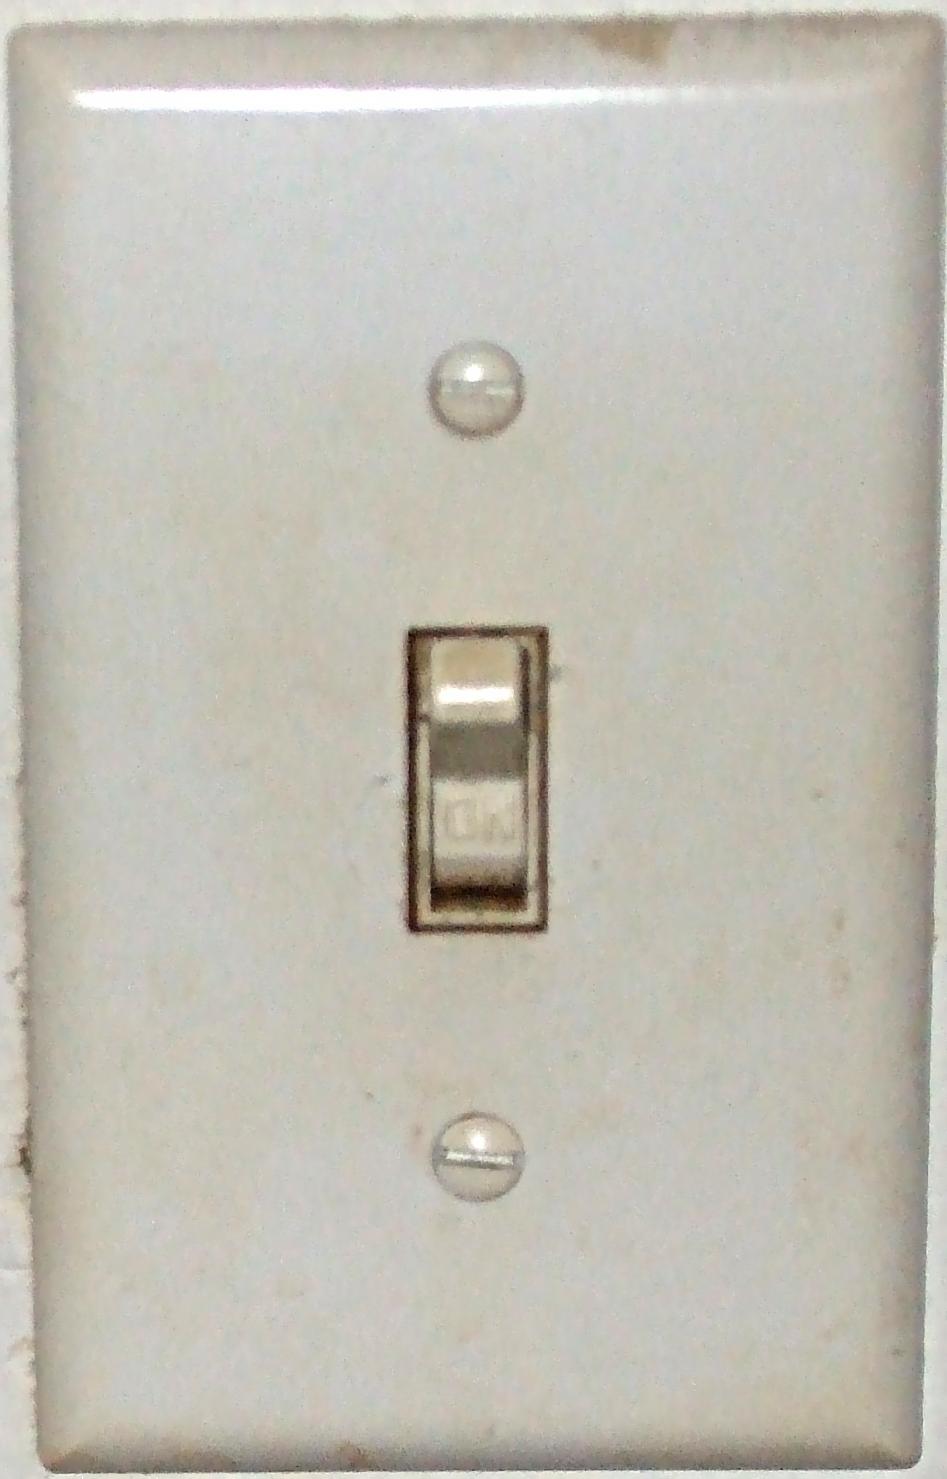 Amazing Leviton Dimmer Switch Wiring Diagram Dv 603pg Gallery ...